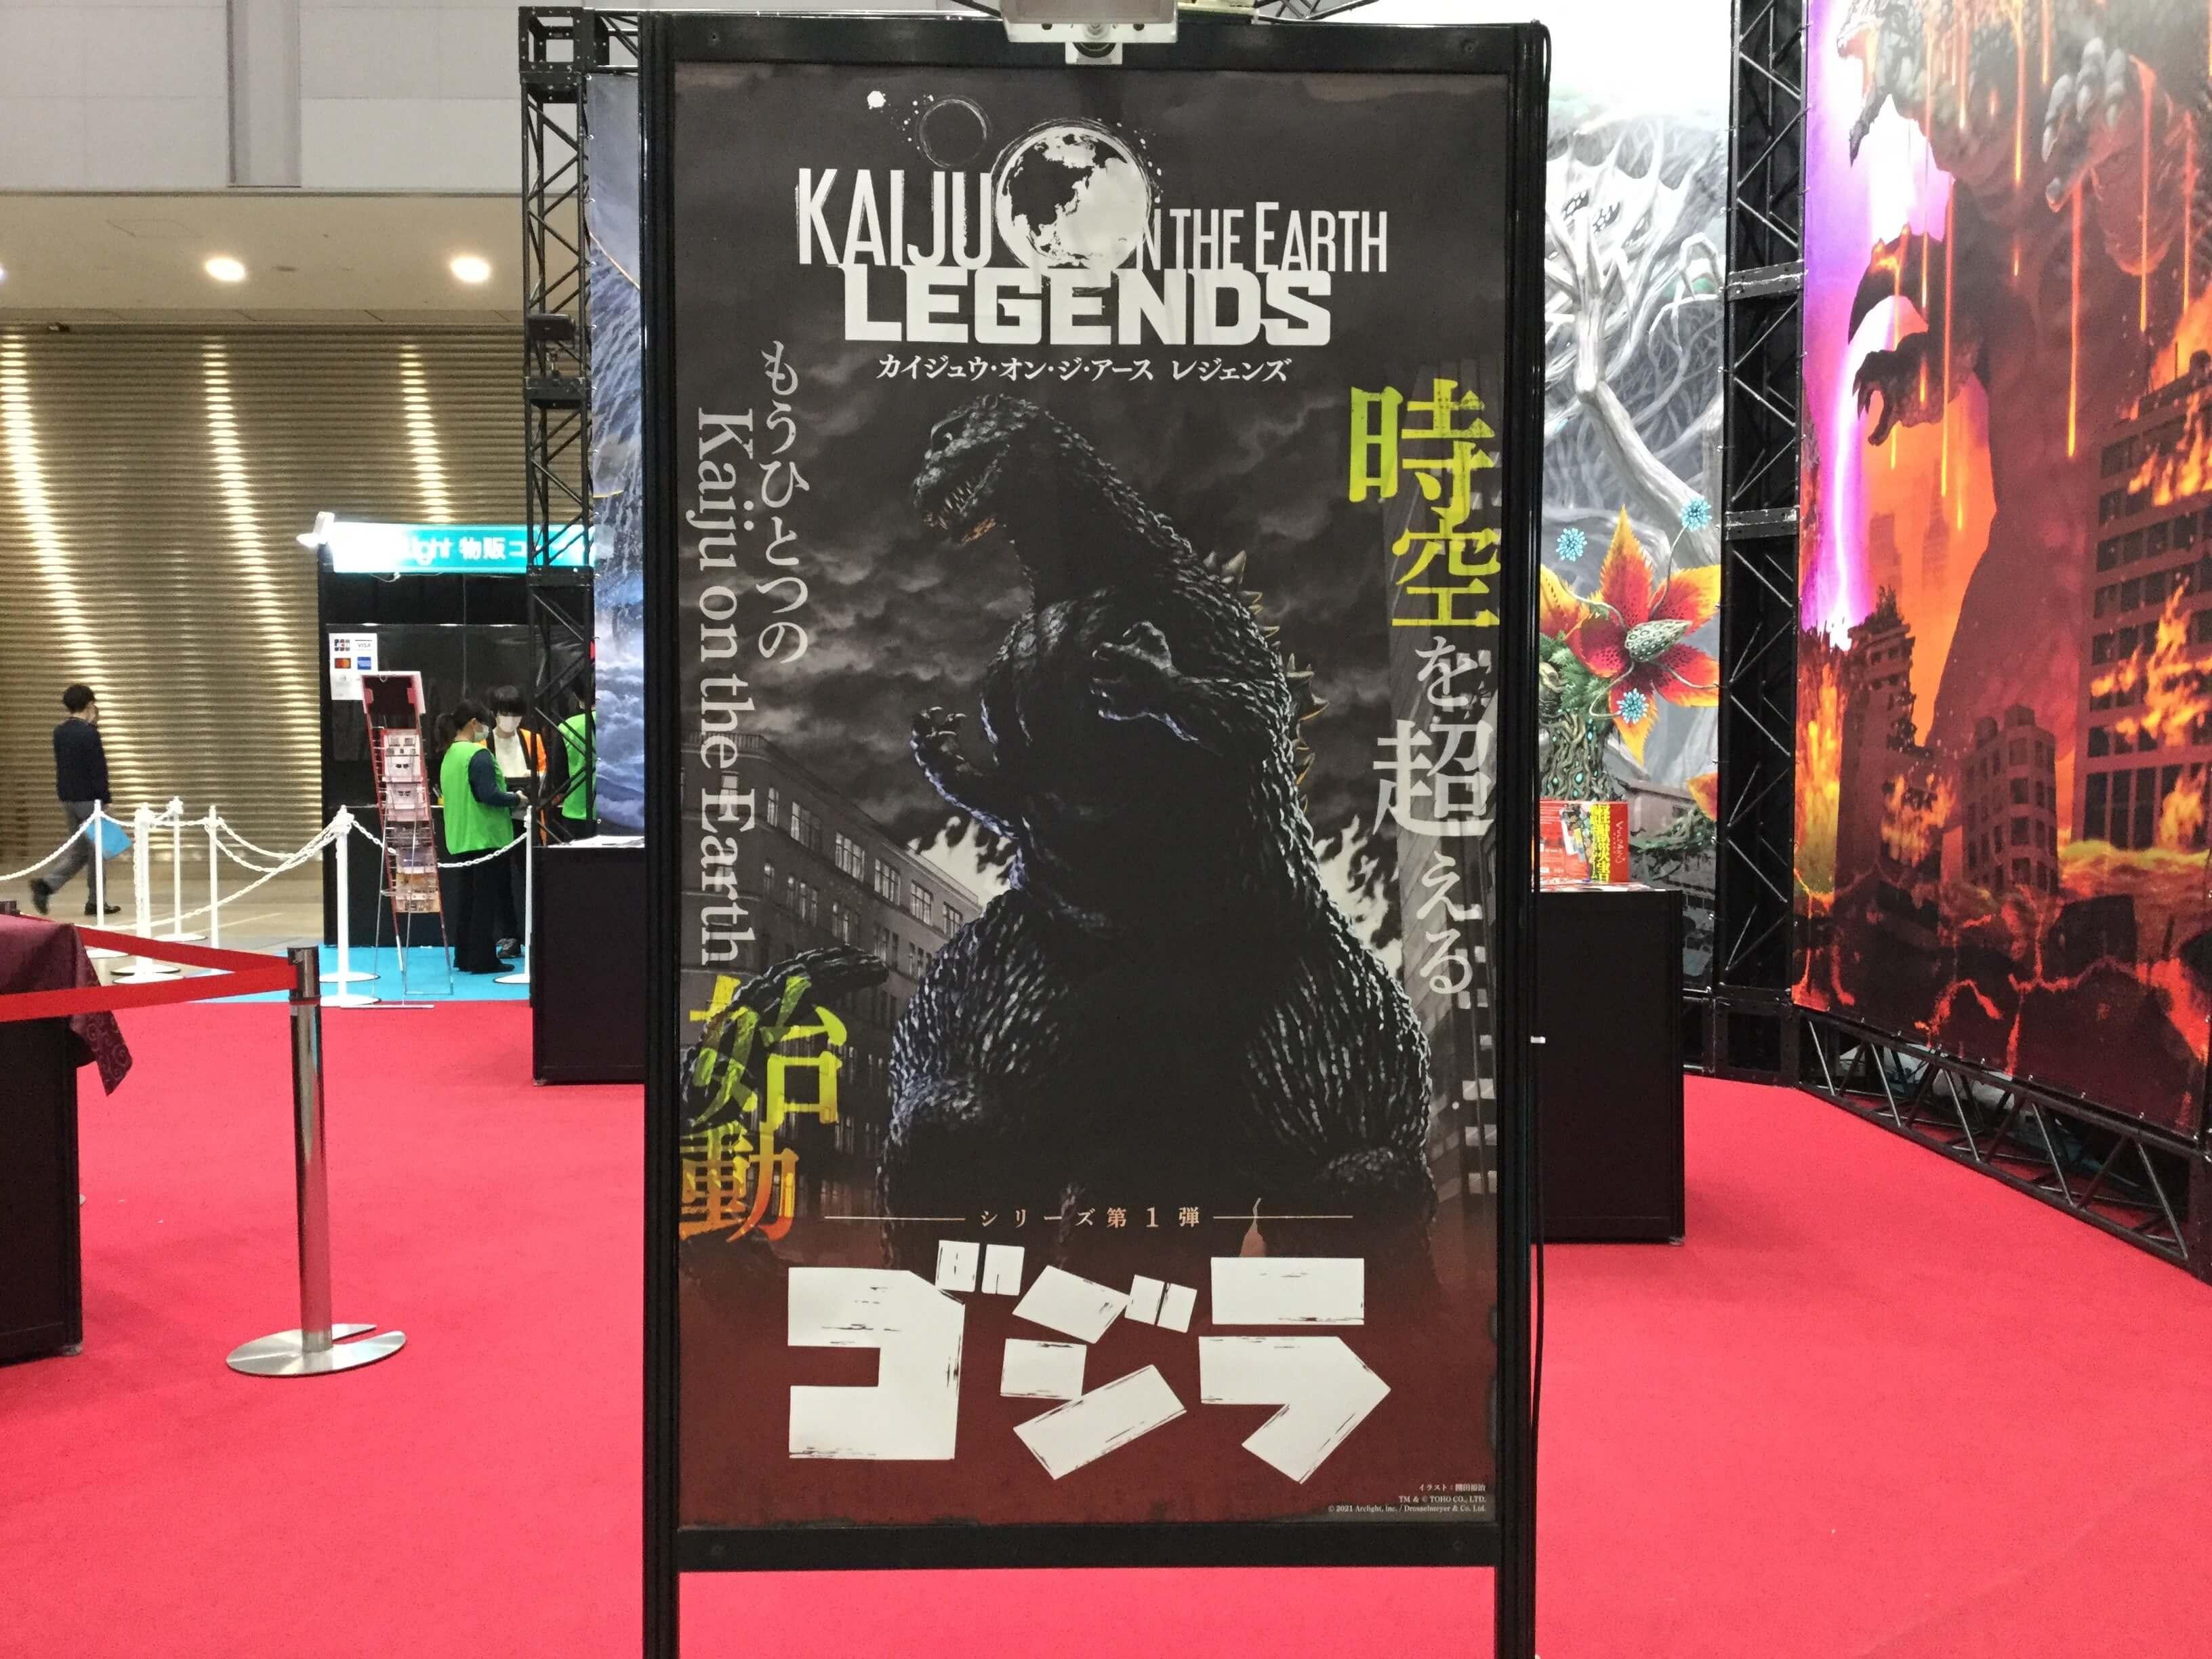 kaiju-on-the-earth-legends-6-1-2